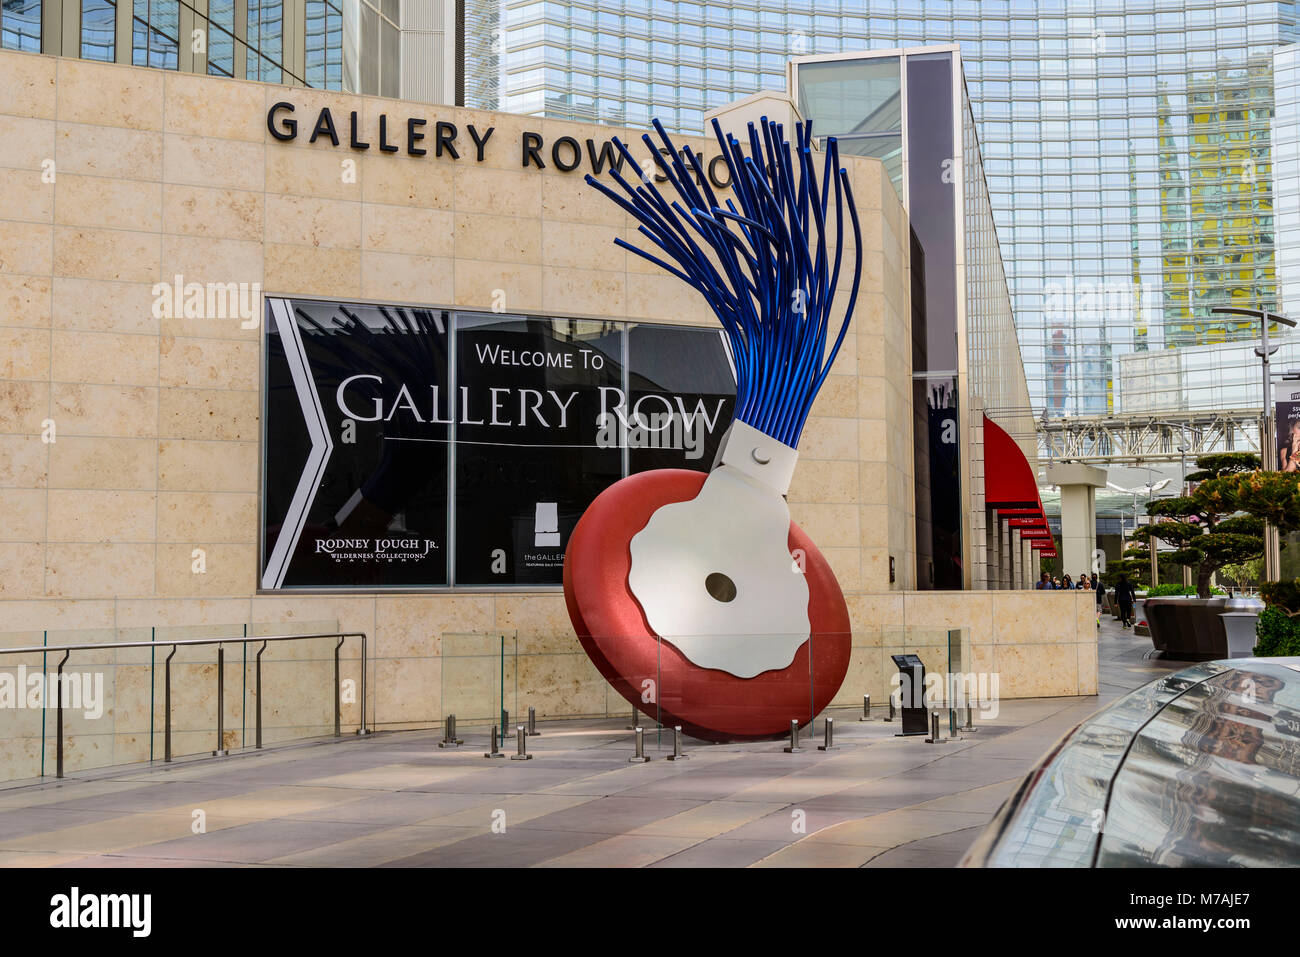 The USA, Nevada, Clark County, Las Vegas, west Harmon Avenue, city centre, Claes Oldenburg sculpture - Stock Image